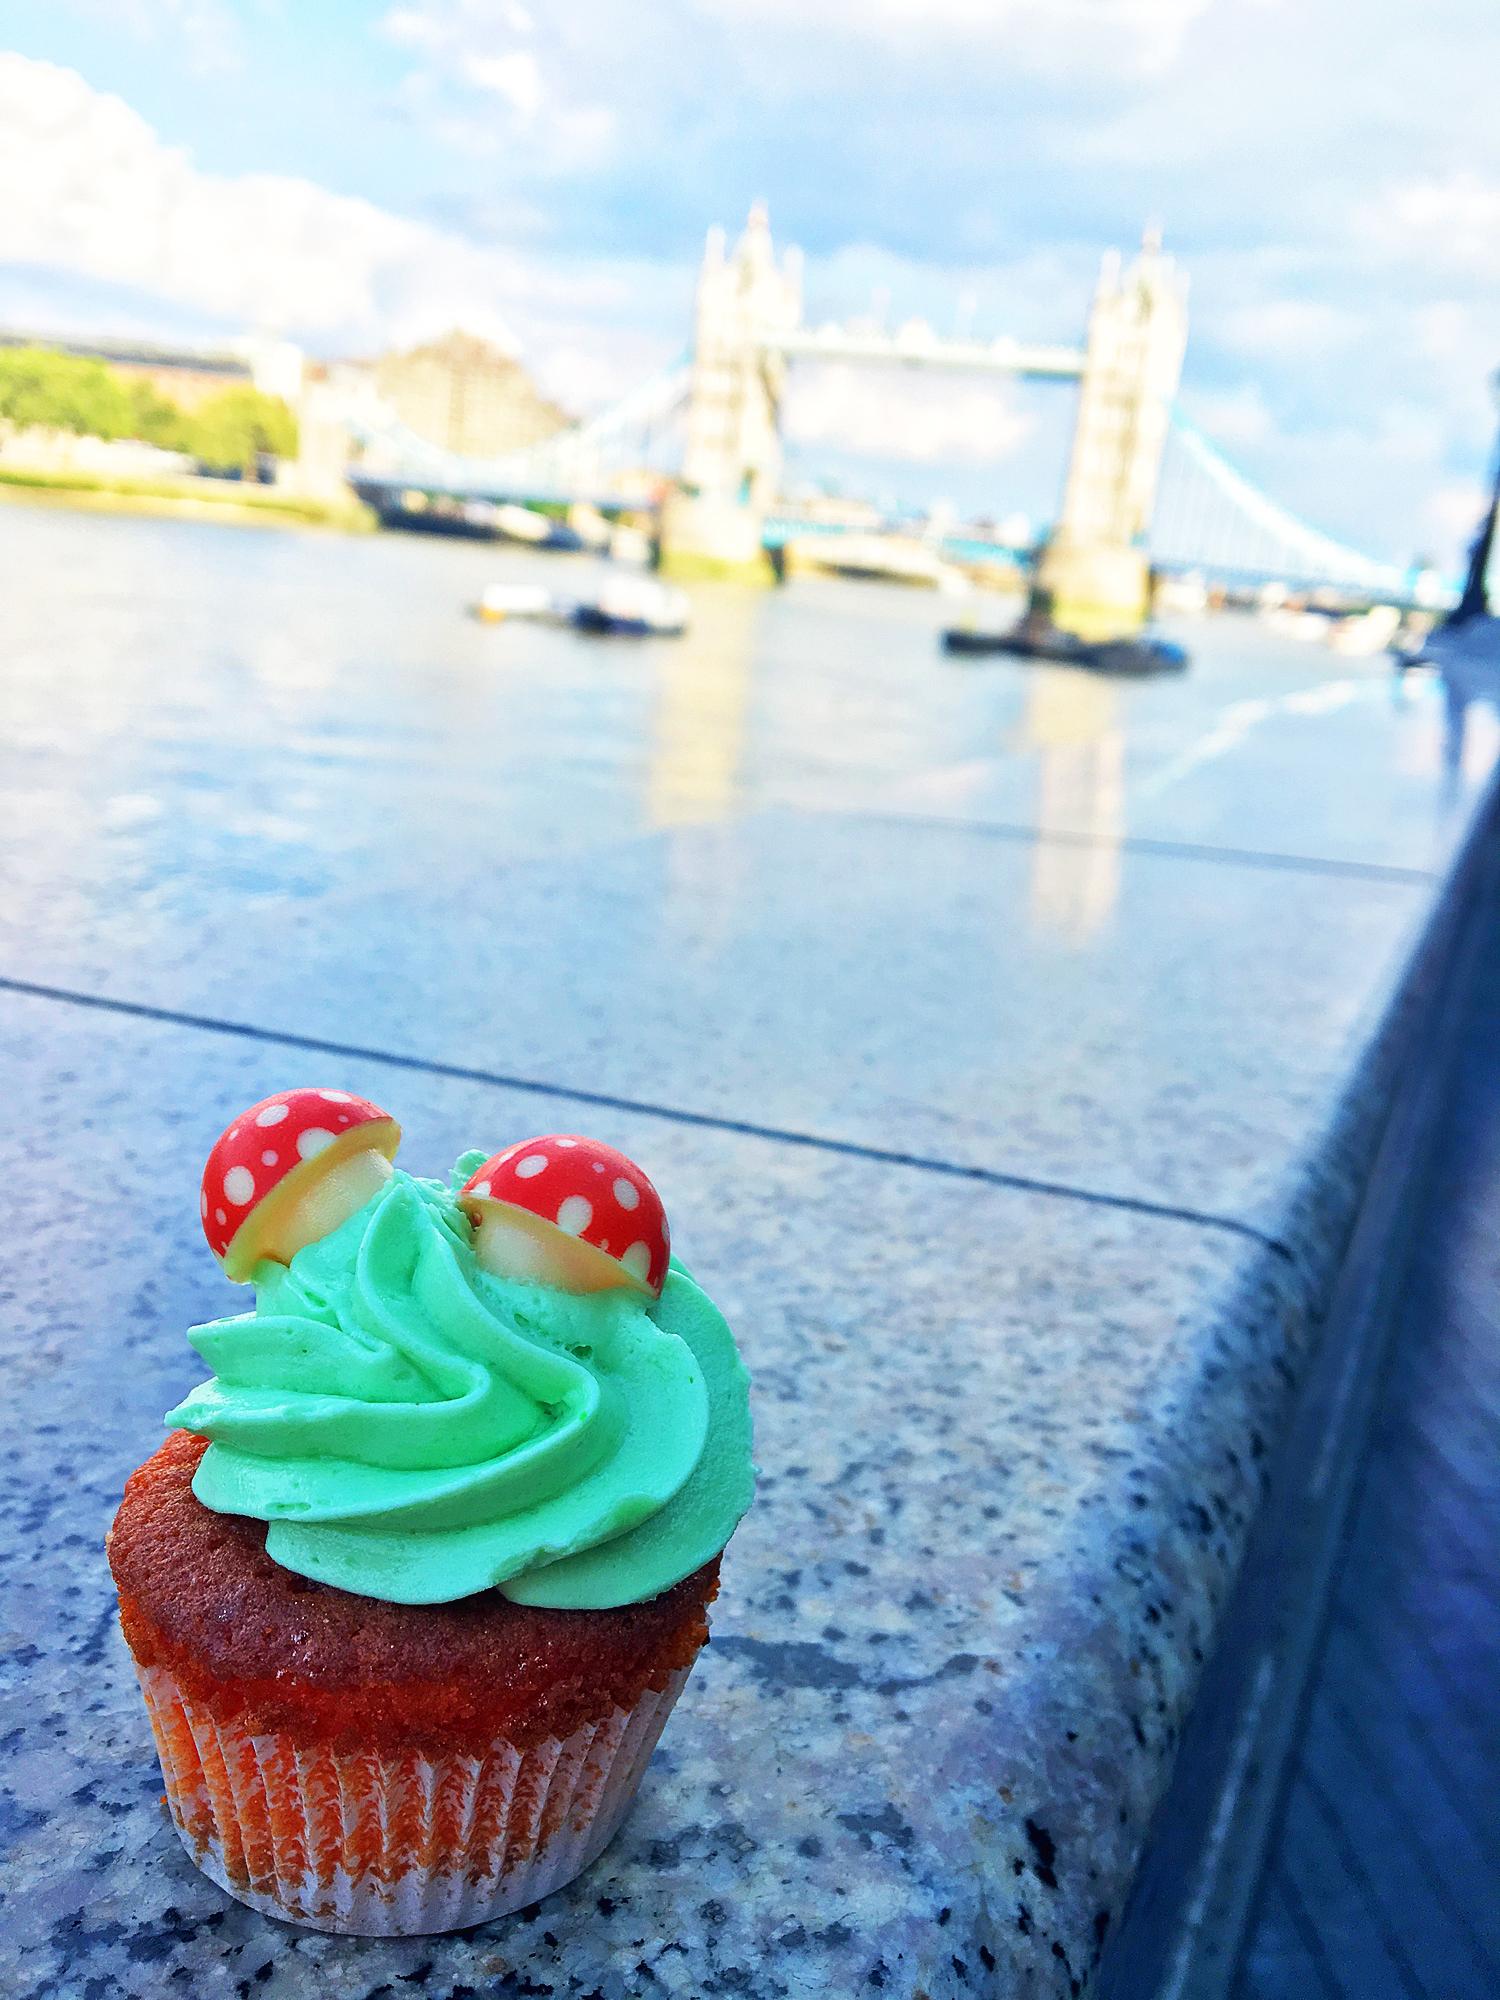 afternoon-tea-london-cupcake-vor-tower-bridge